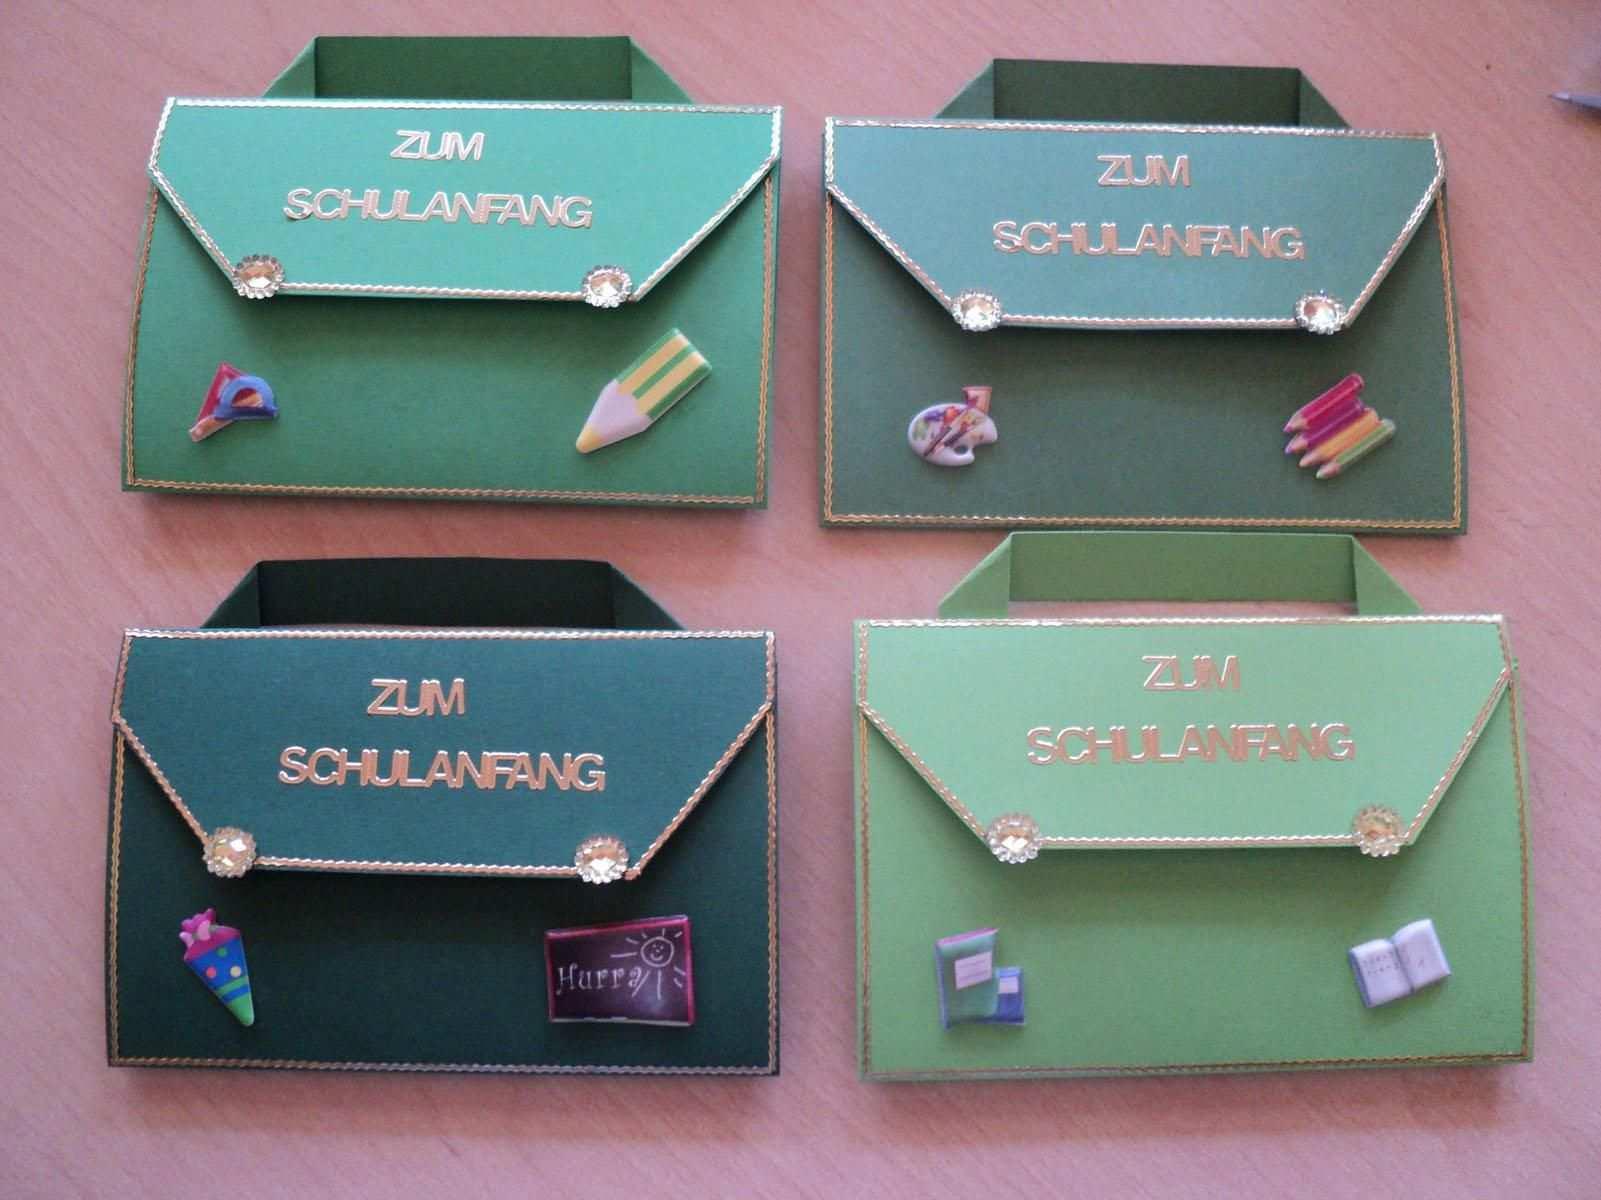 The Wonderful Einladungskarten Einschulung Selber Basteln Photo Below Is Section Of E Einladung Einschulung Einladung Schulanfang Einladungskarten Einschulung